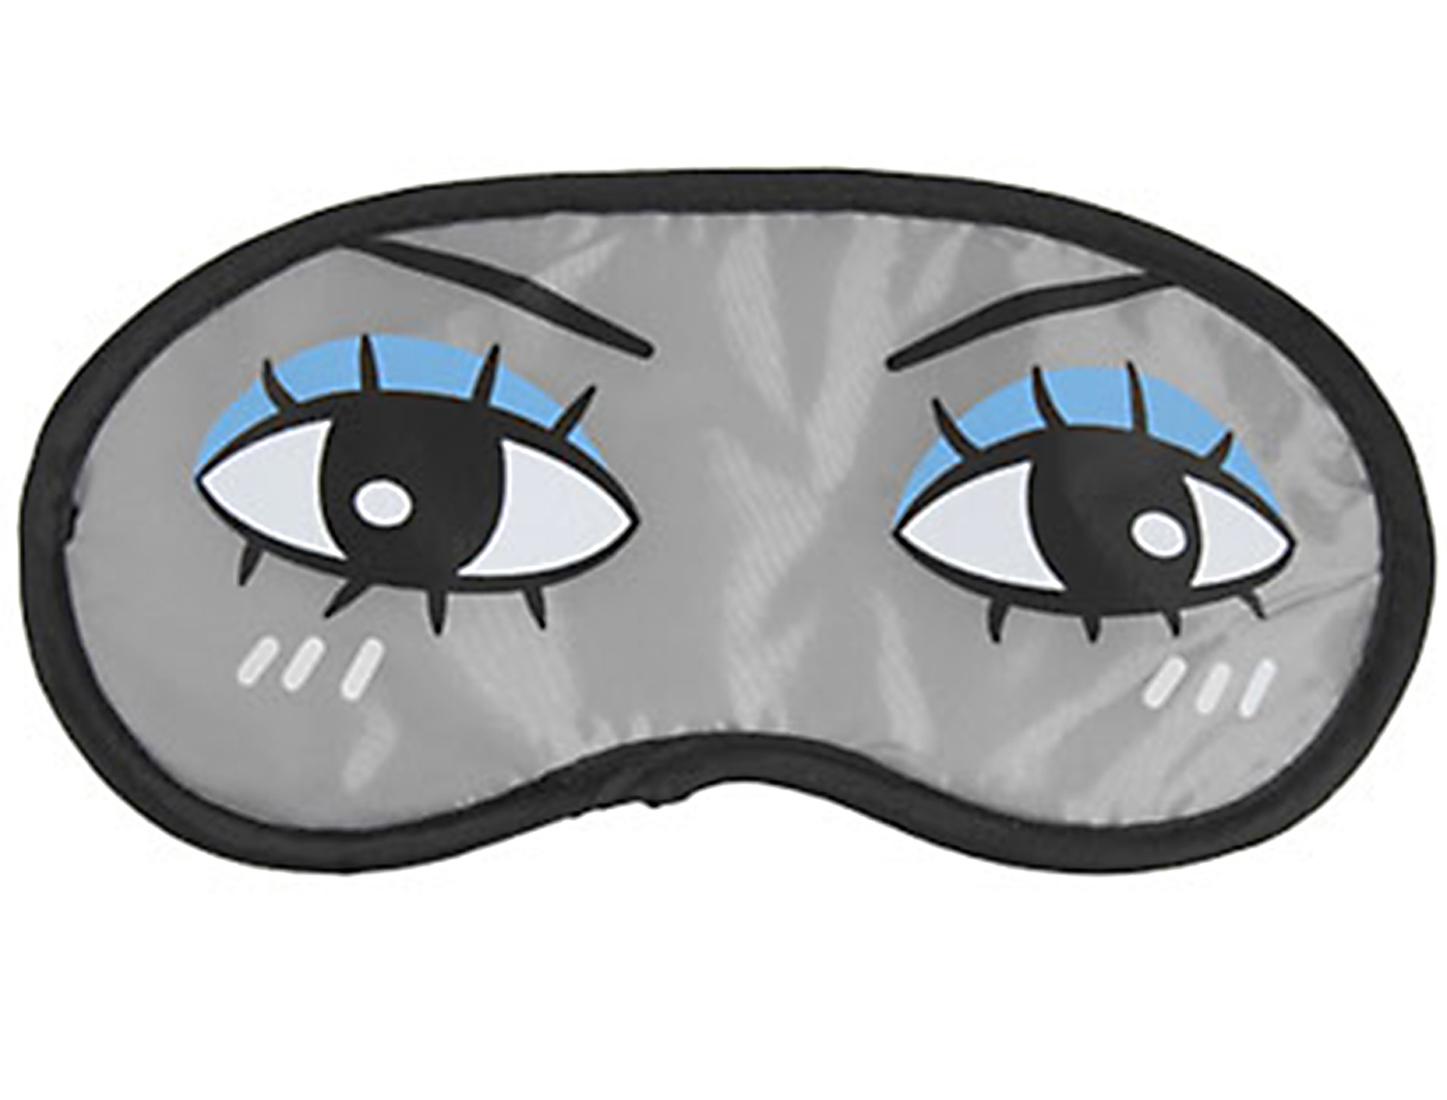 2 Pcs Carton Tearful Eyes Print Blue Eye Shadow Sleeping Eye Mask Cover Eyeshade Grey